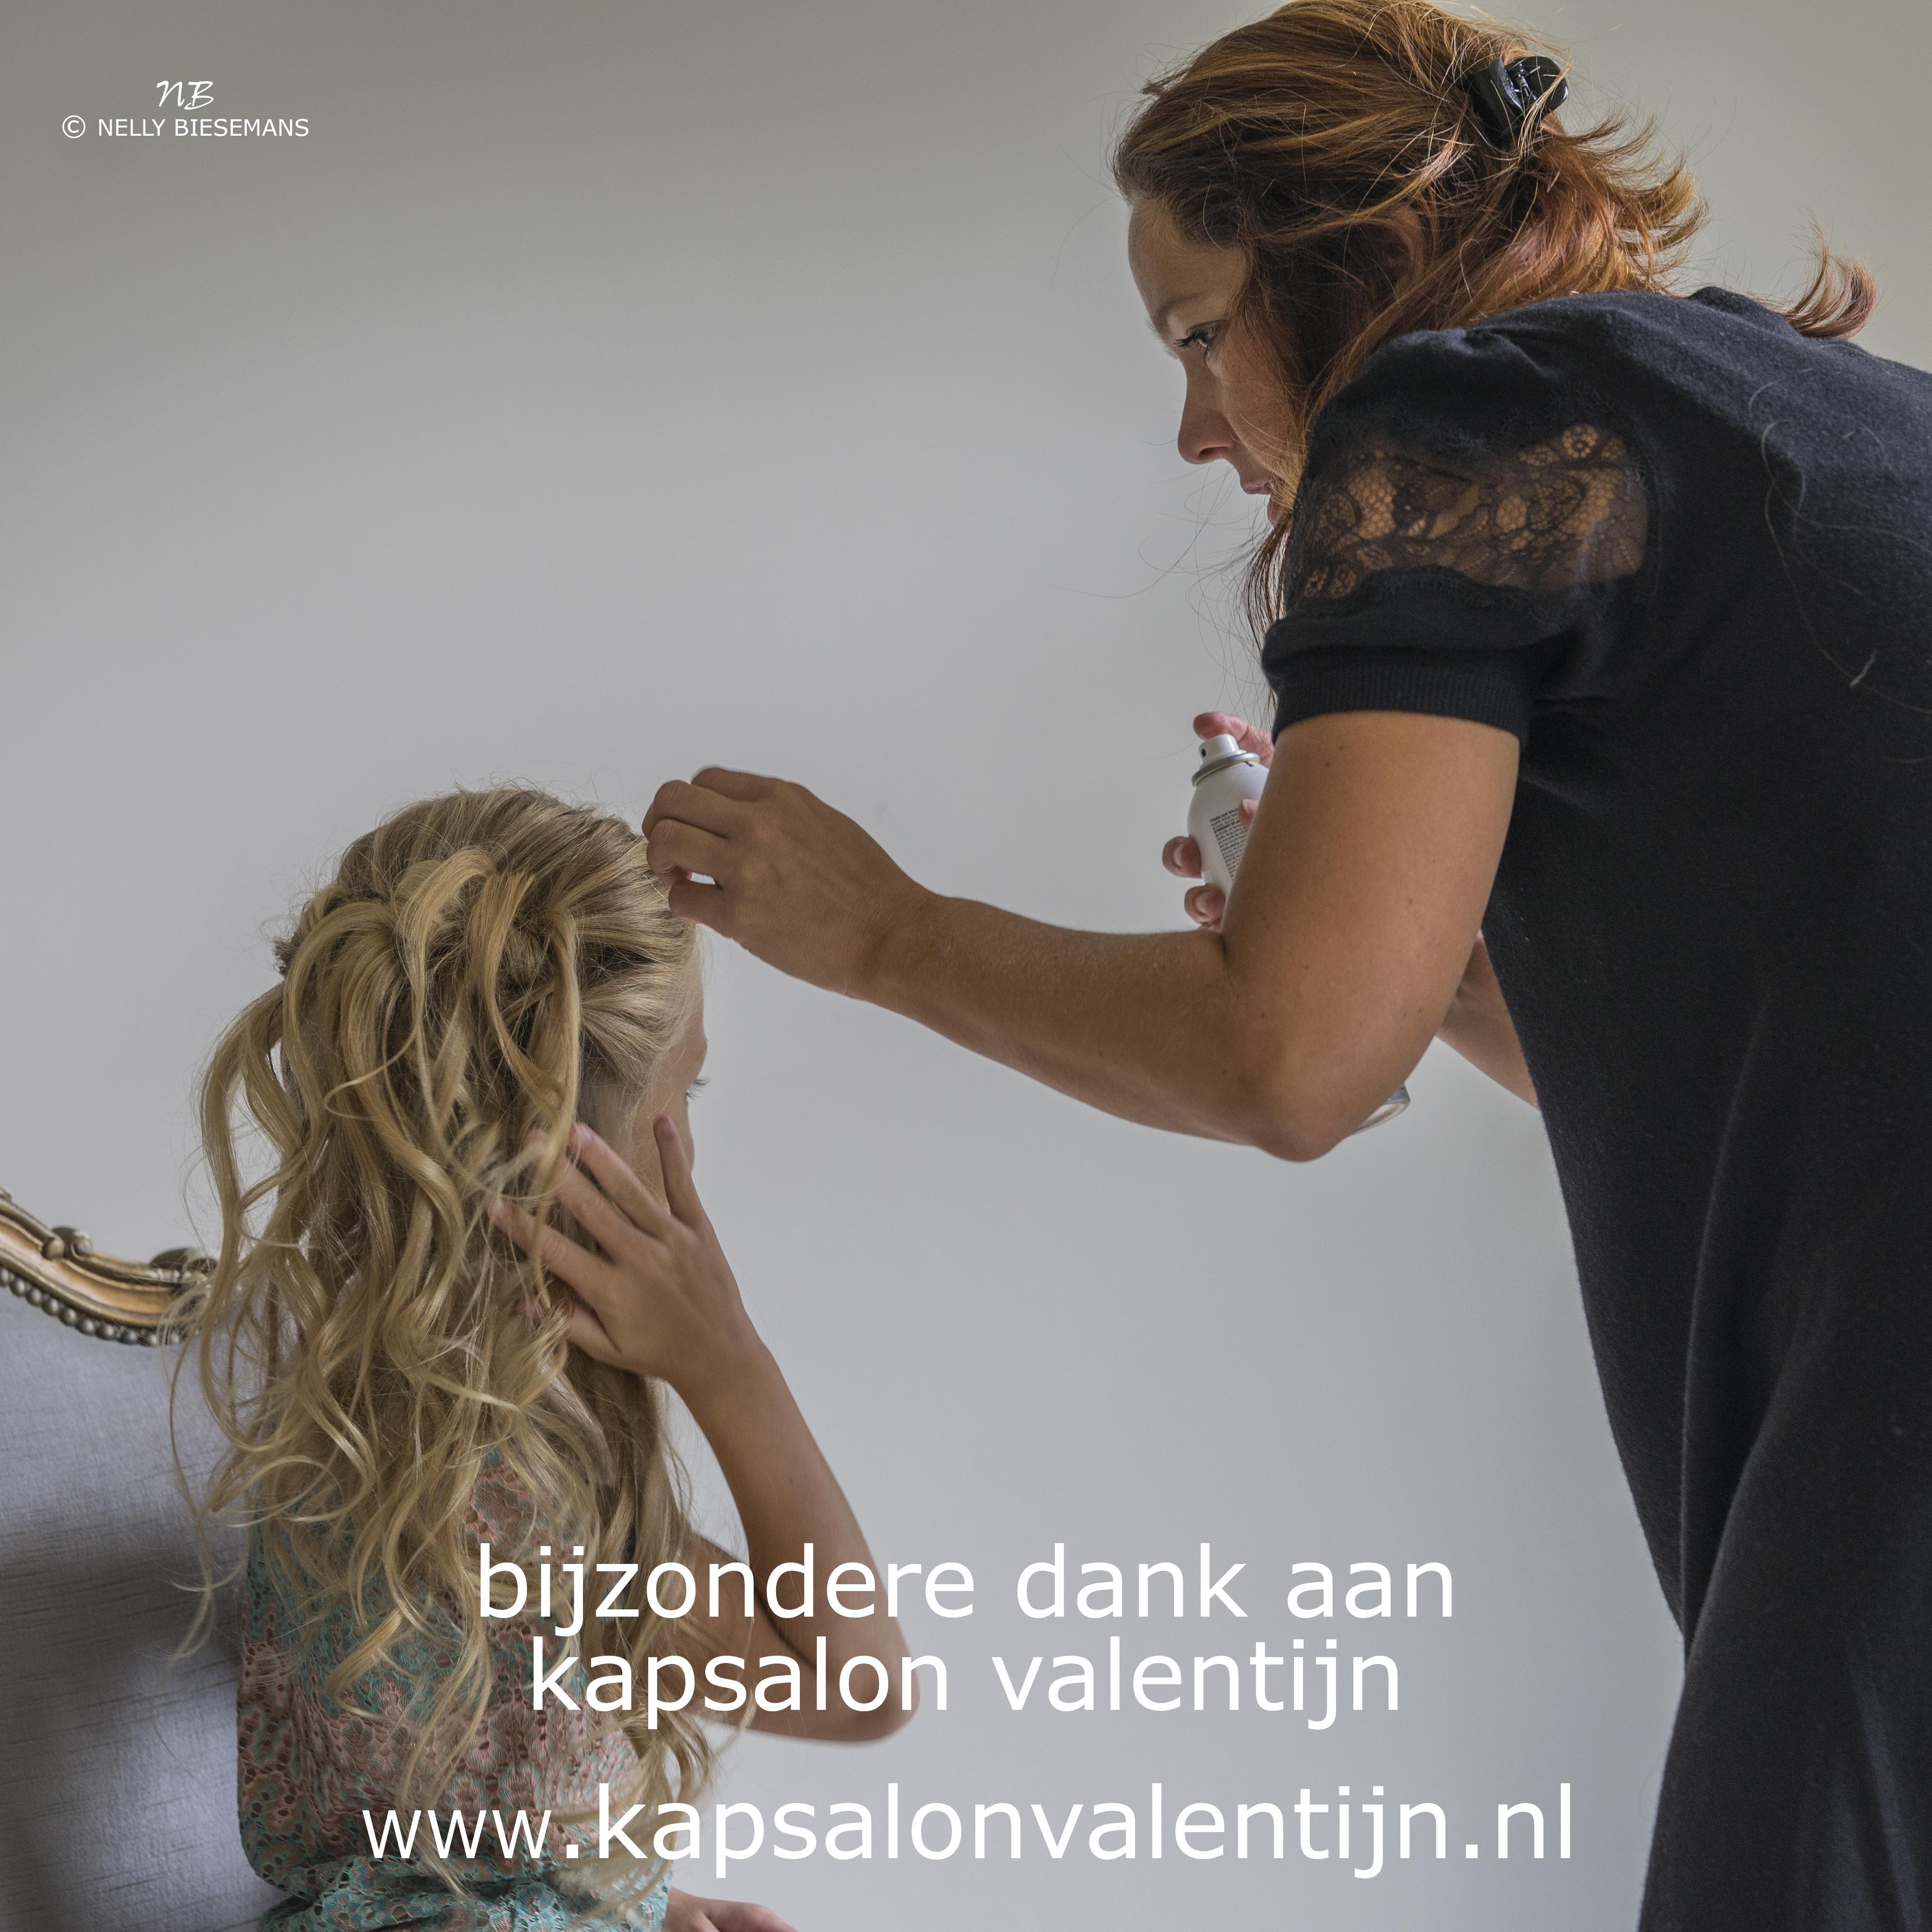 exclusieve communiejurk – bruidsmeisje – vormsel – Nelly Biesemans – www.nb4kids.com – dank aan (2)